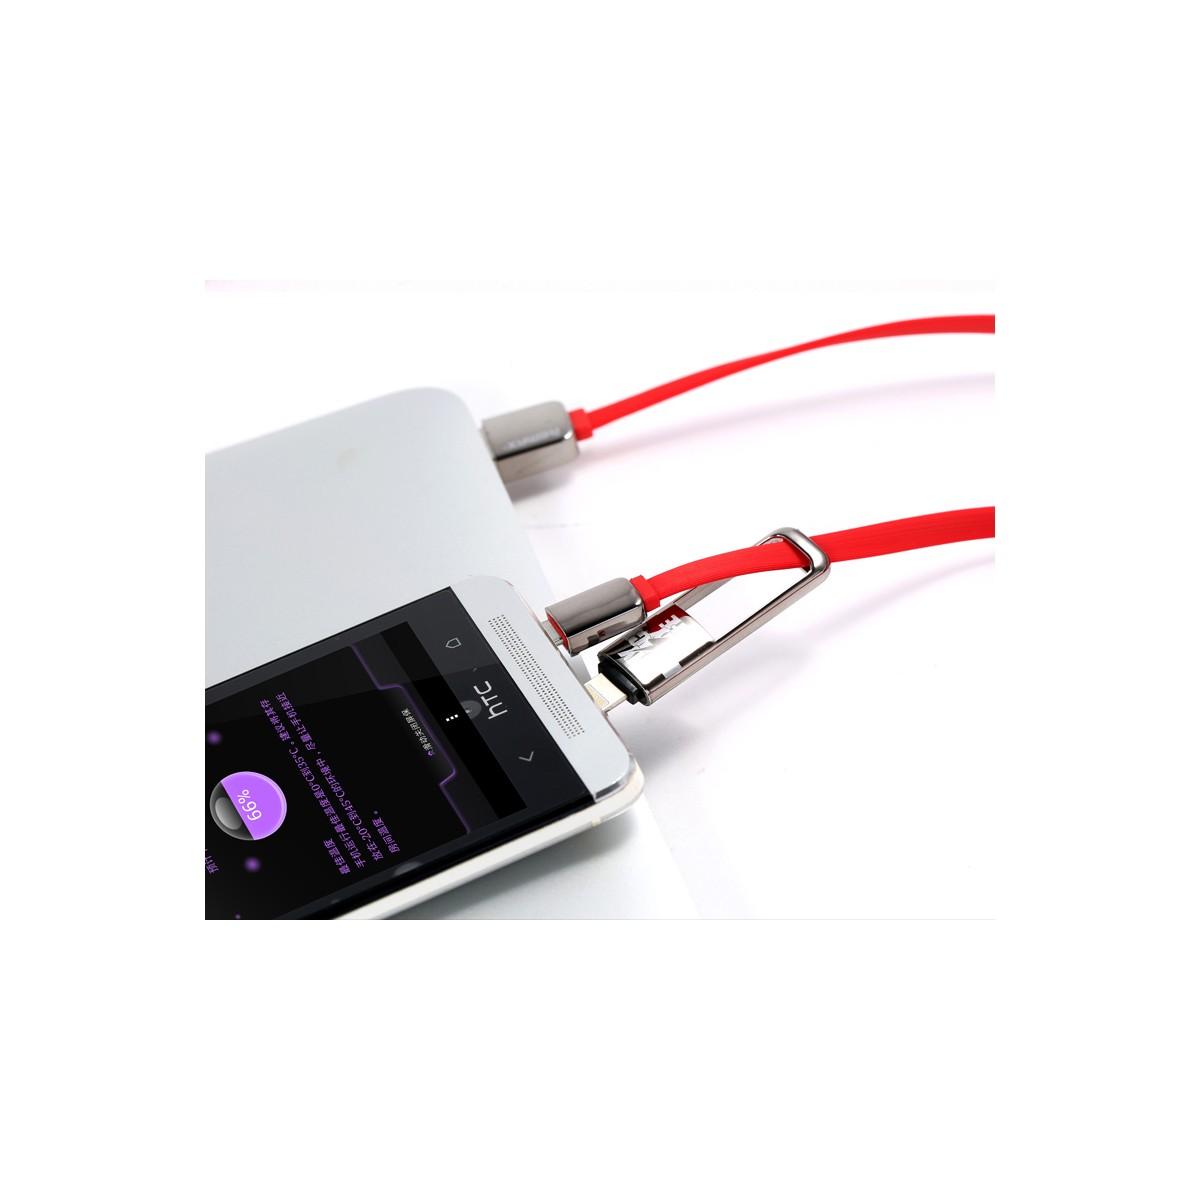 Datový kabel 2v1 , Micro USB - lightning konektor